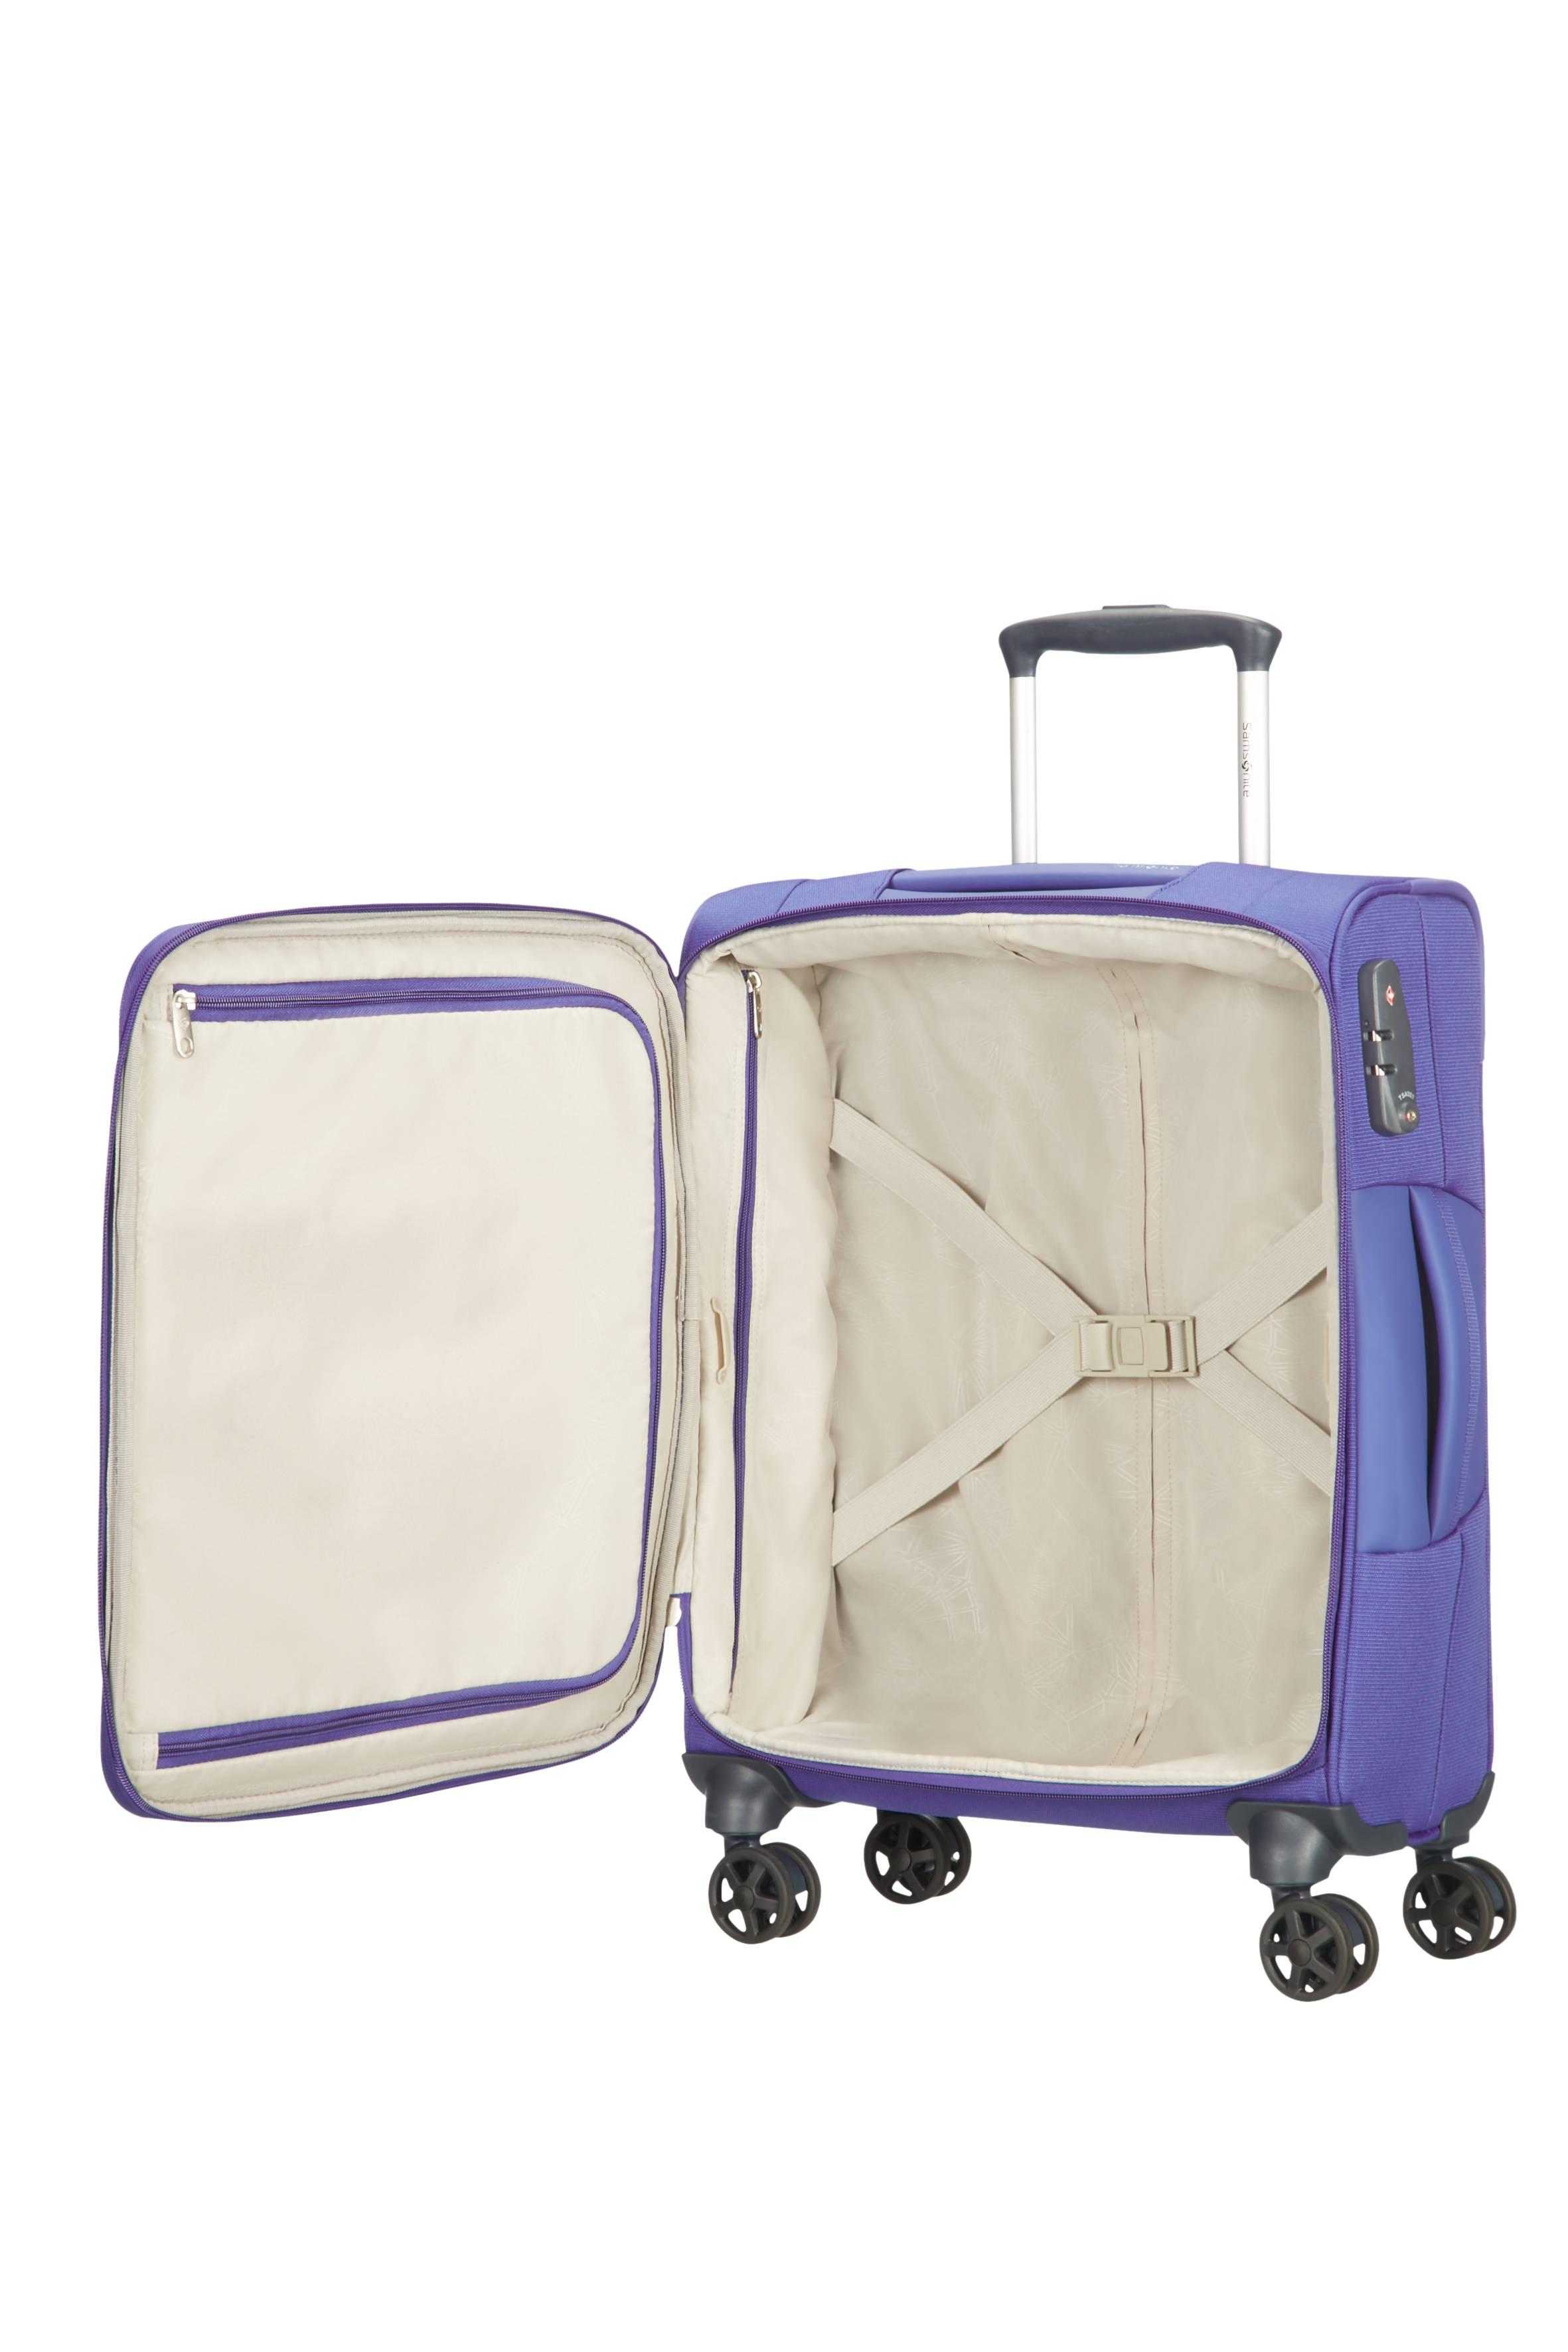 valise cabine samsonite dynamo blue en vente au meilleur prix. Black Bedroom Furniture Sets. Home Design Ideas